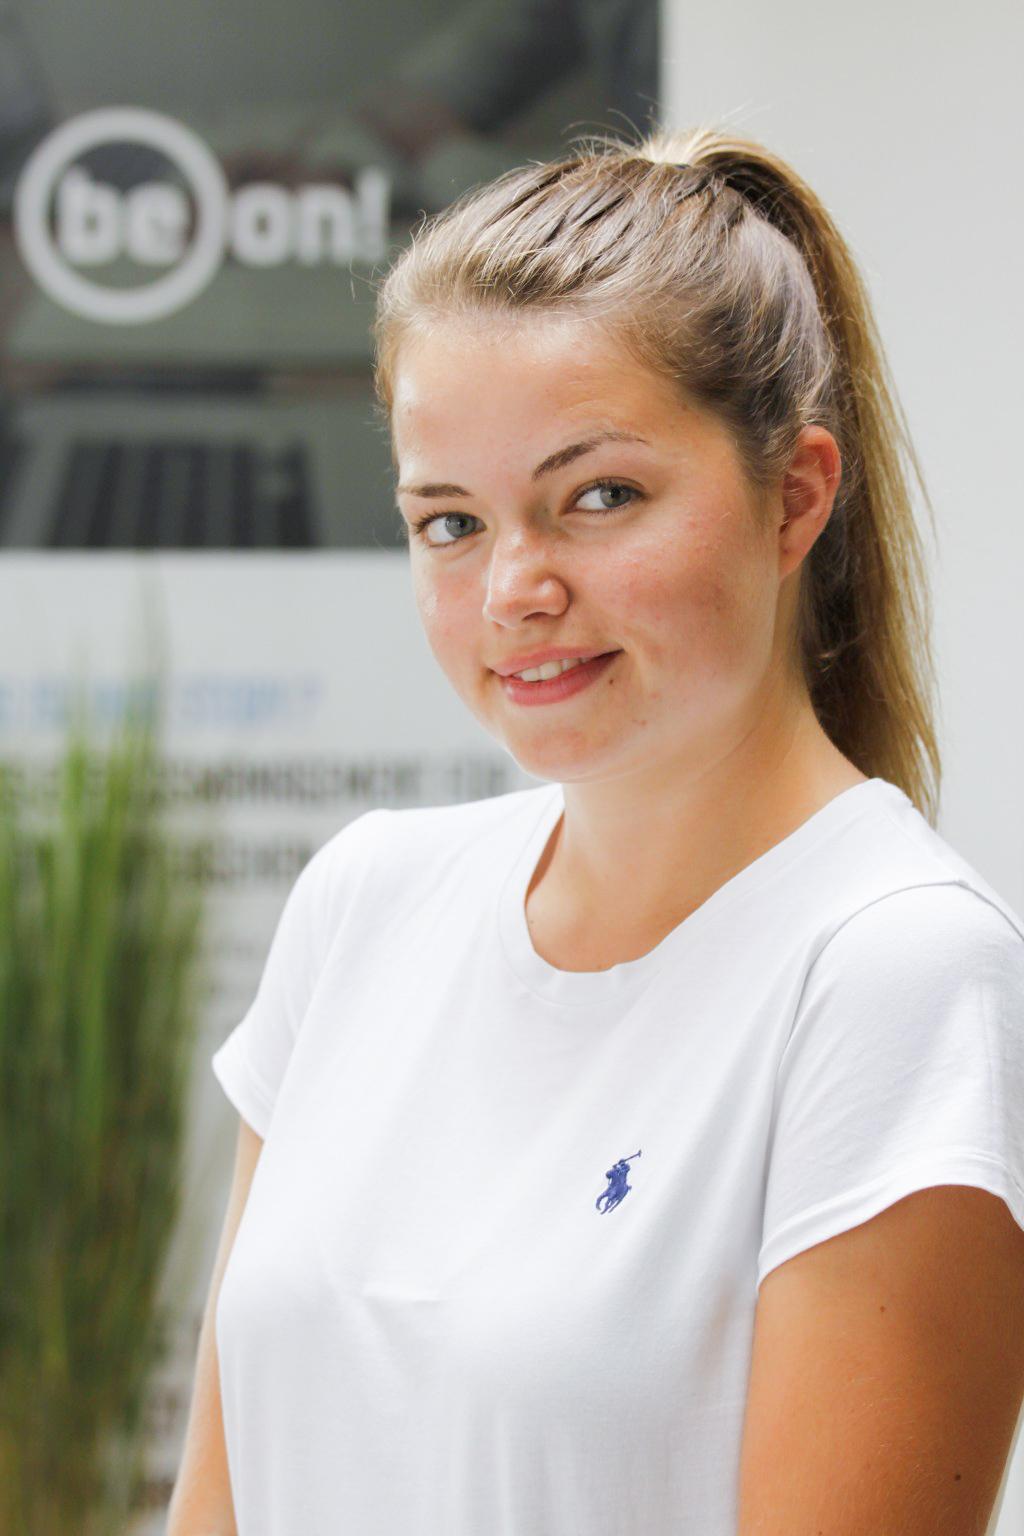 Elena Borgmeyer